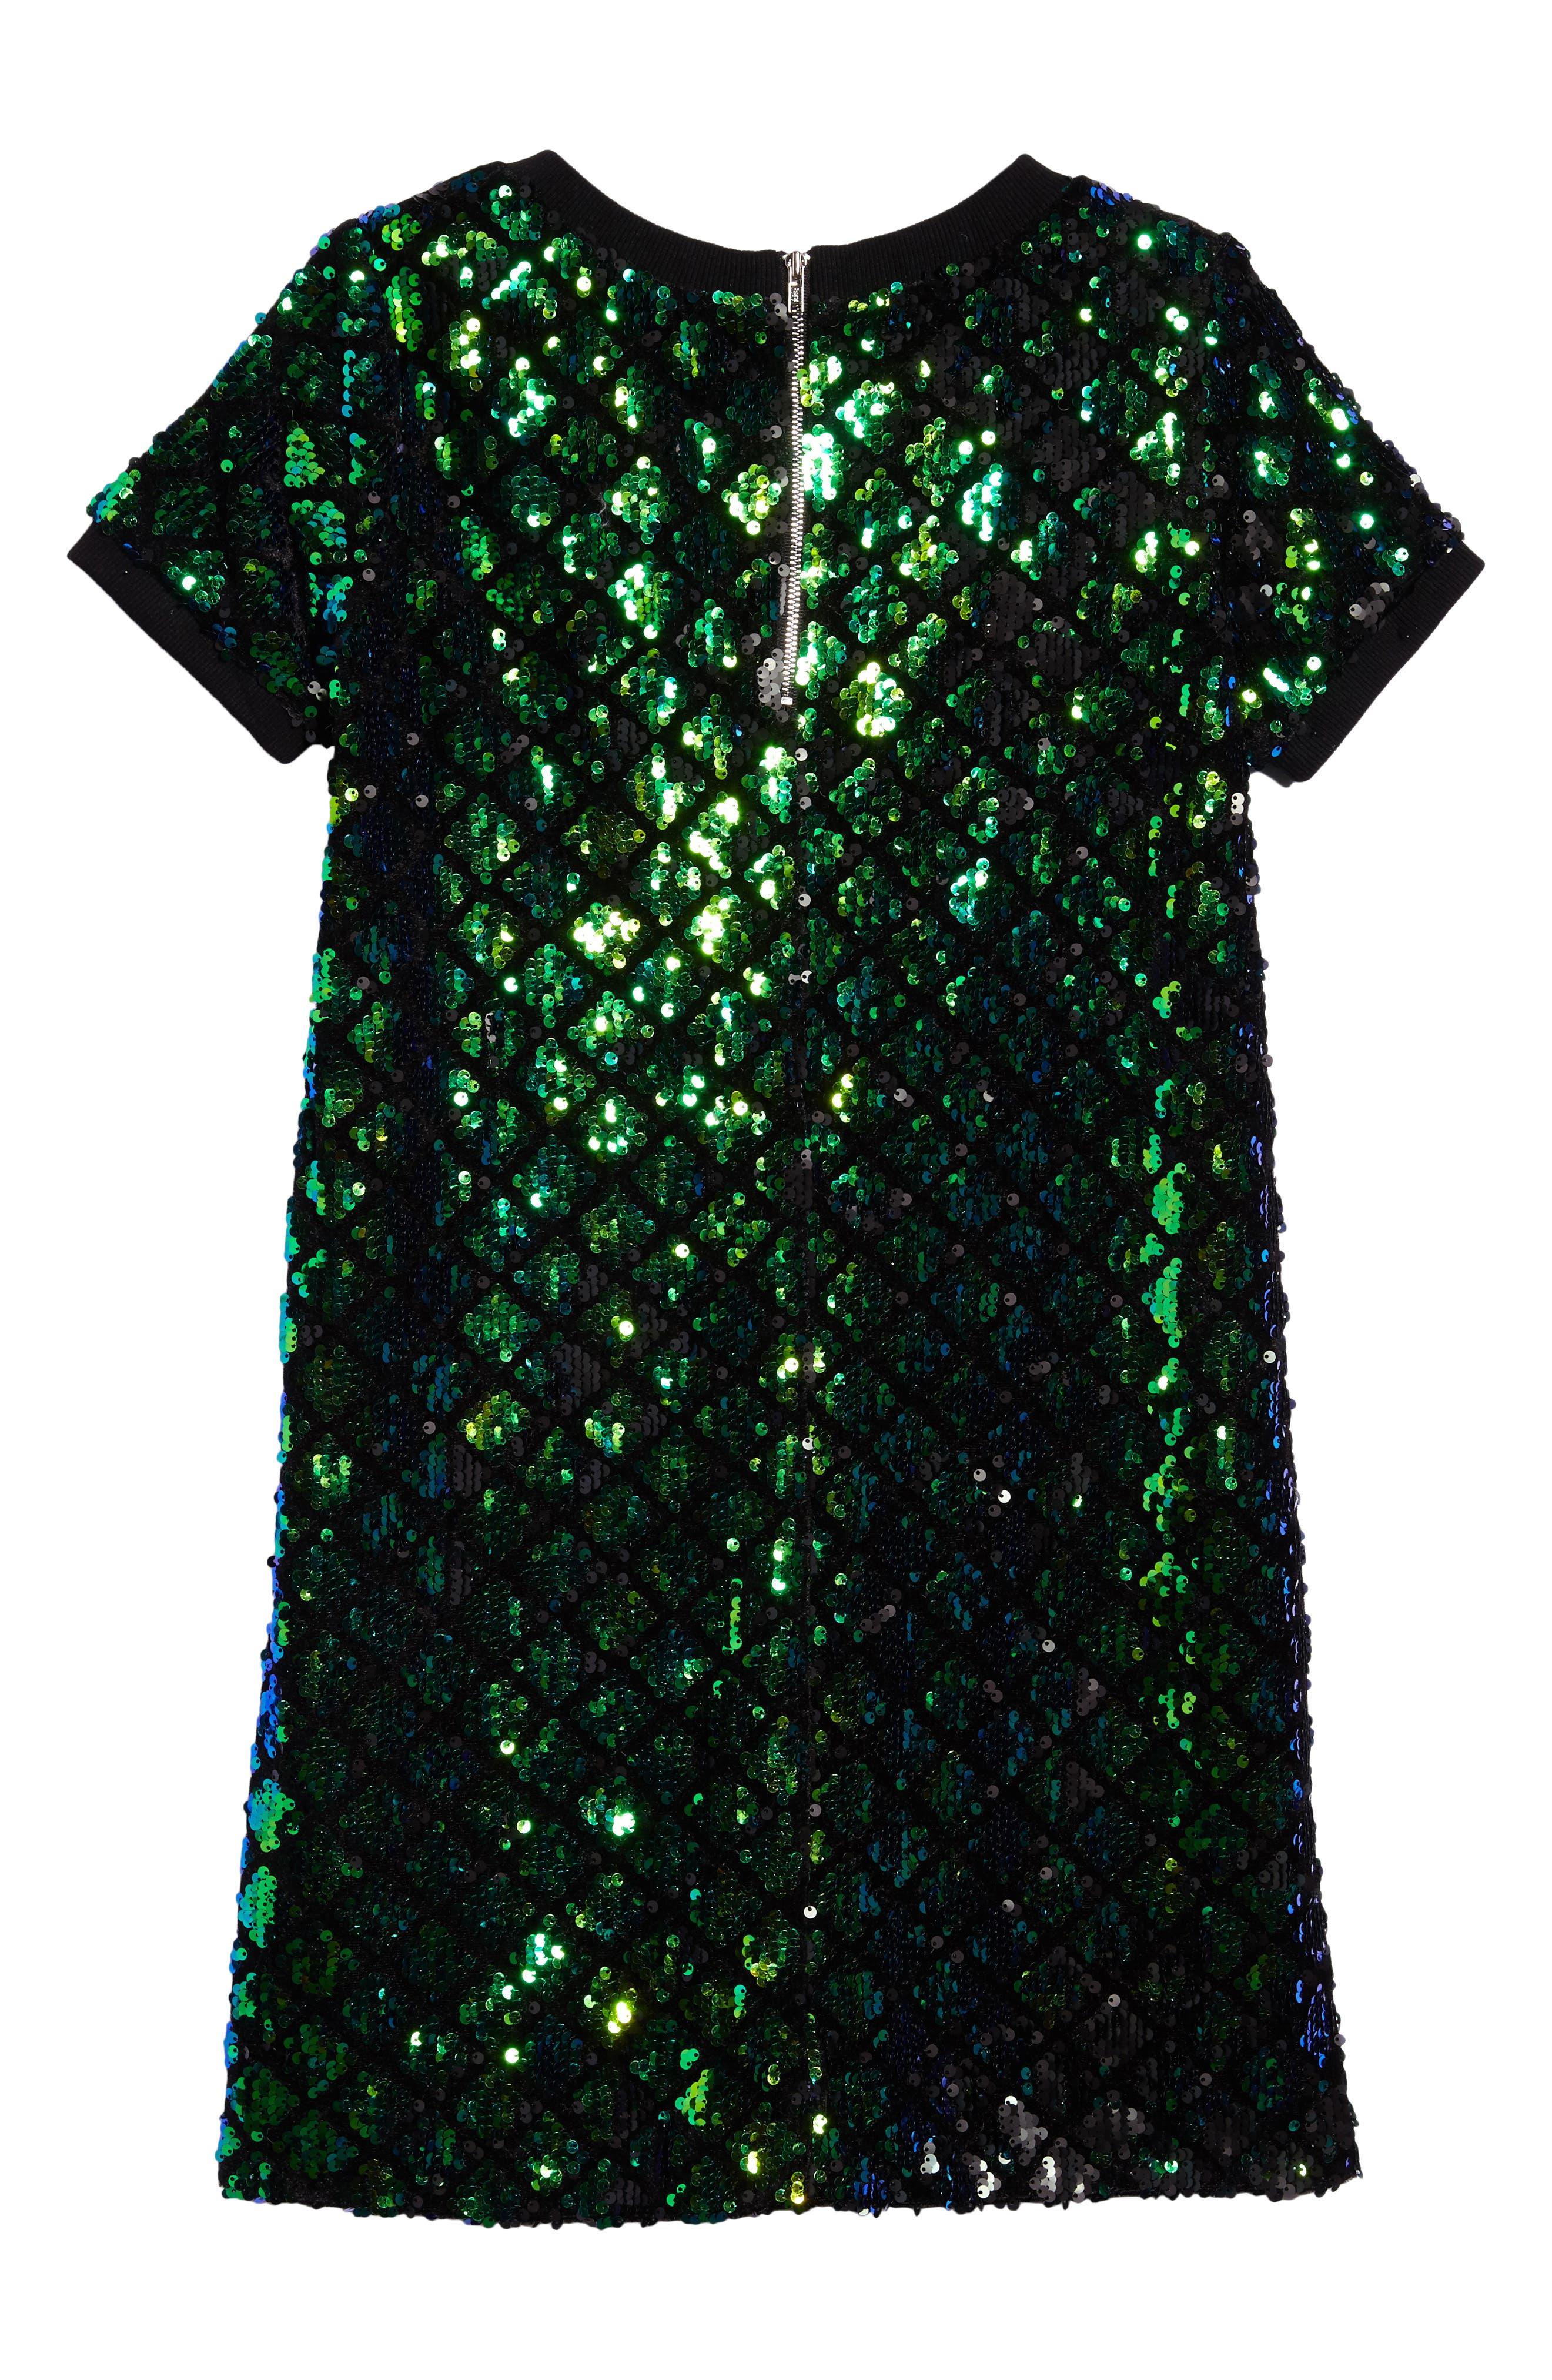 Mermaid Sequin Shift Dress,                             Alternate thumbnail 2, color,                             440